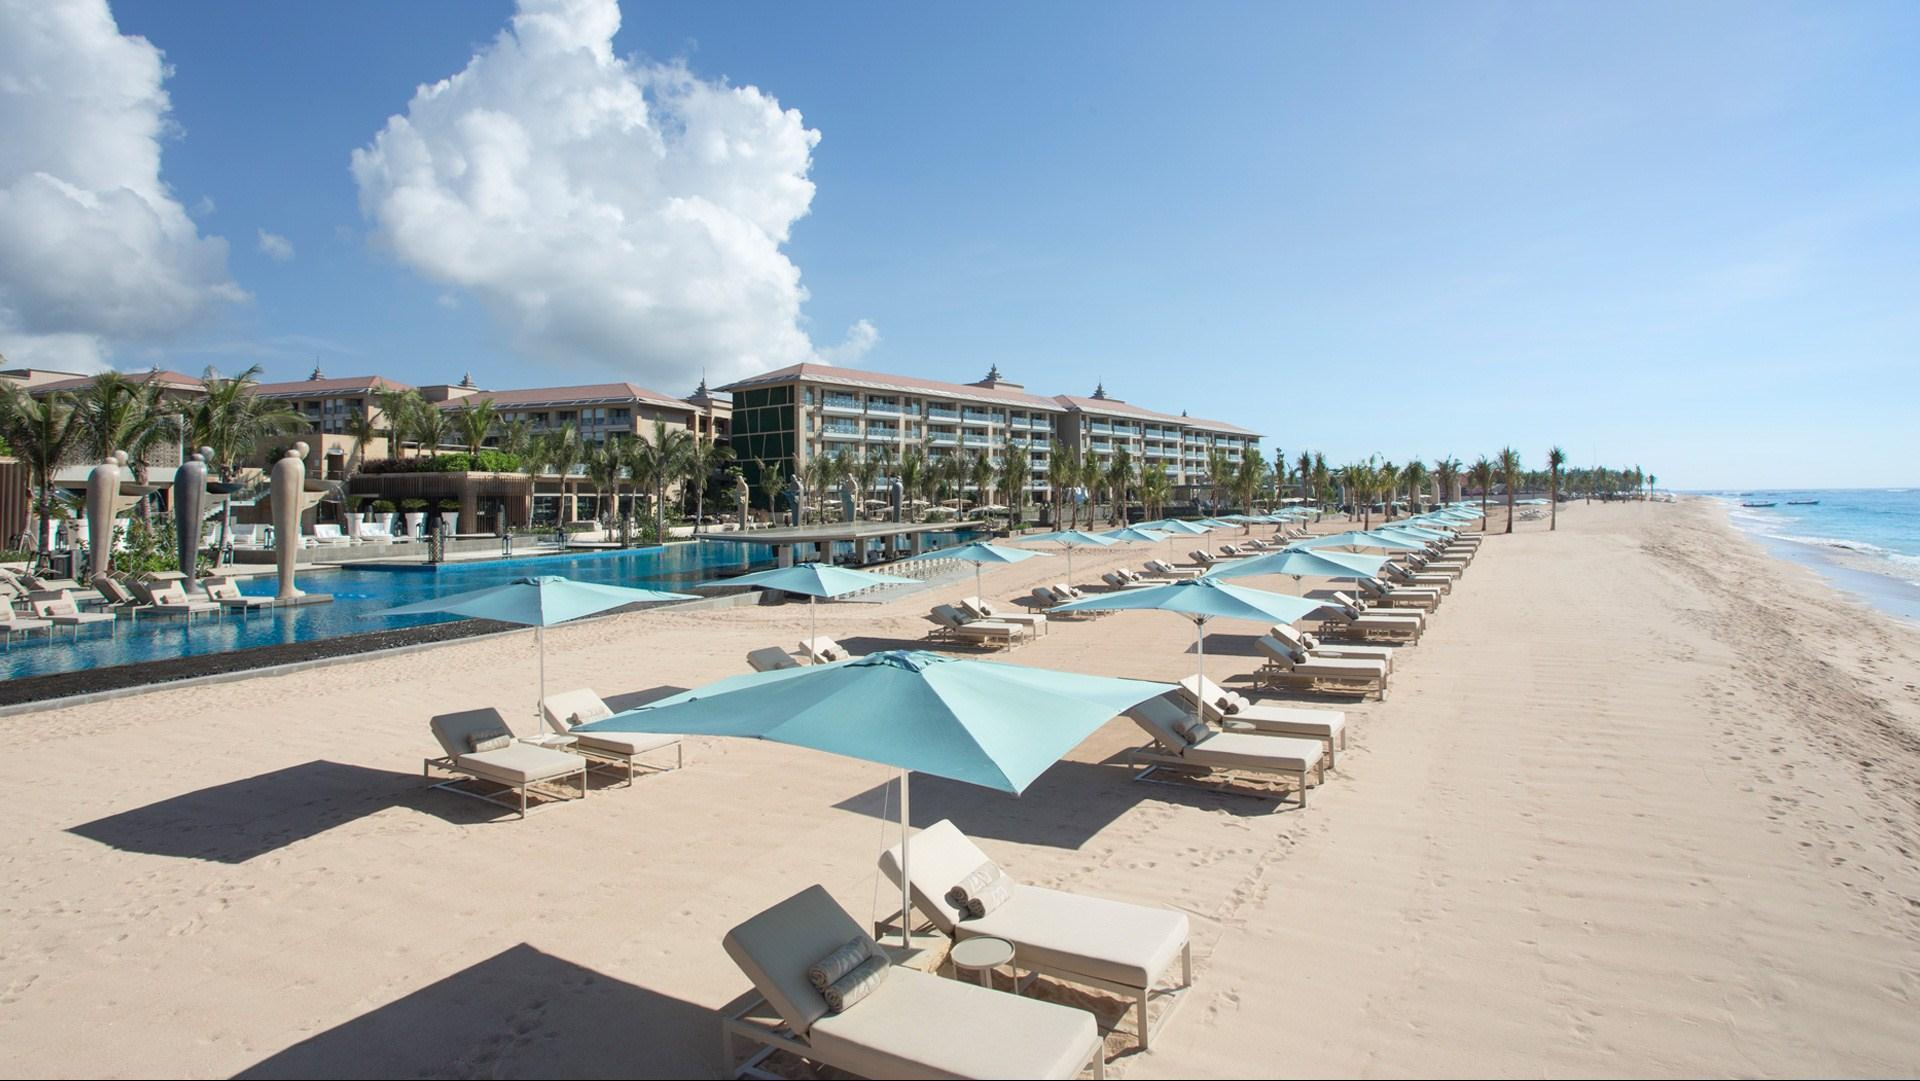 Meetings And Events At The Mulia Mulia Resort Mulia Villas